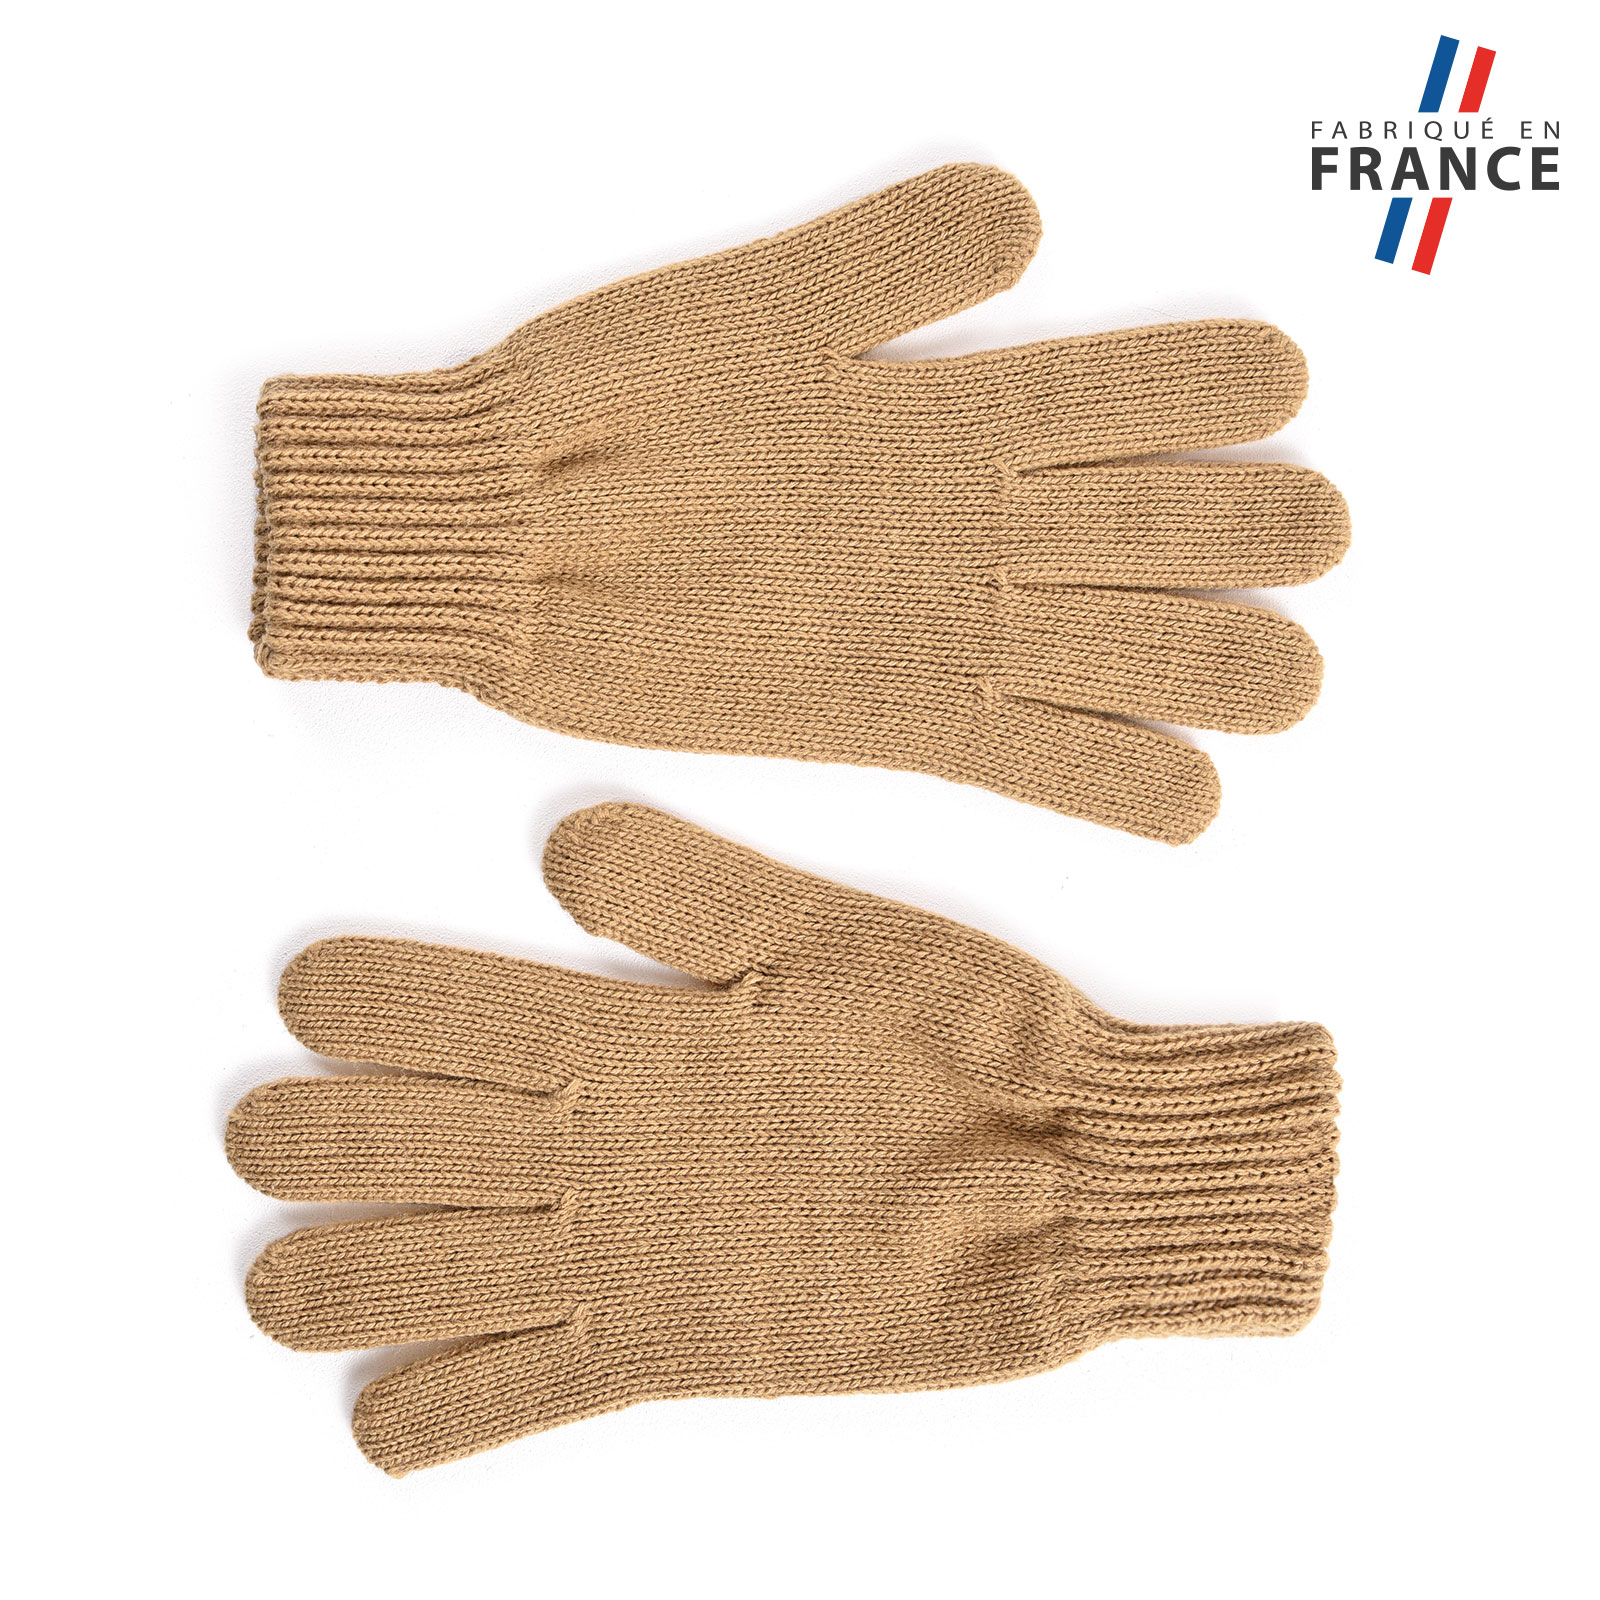 GA-00011-A16-LB_FR-gants-femme-camel-qualicoq